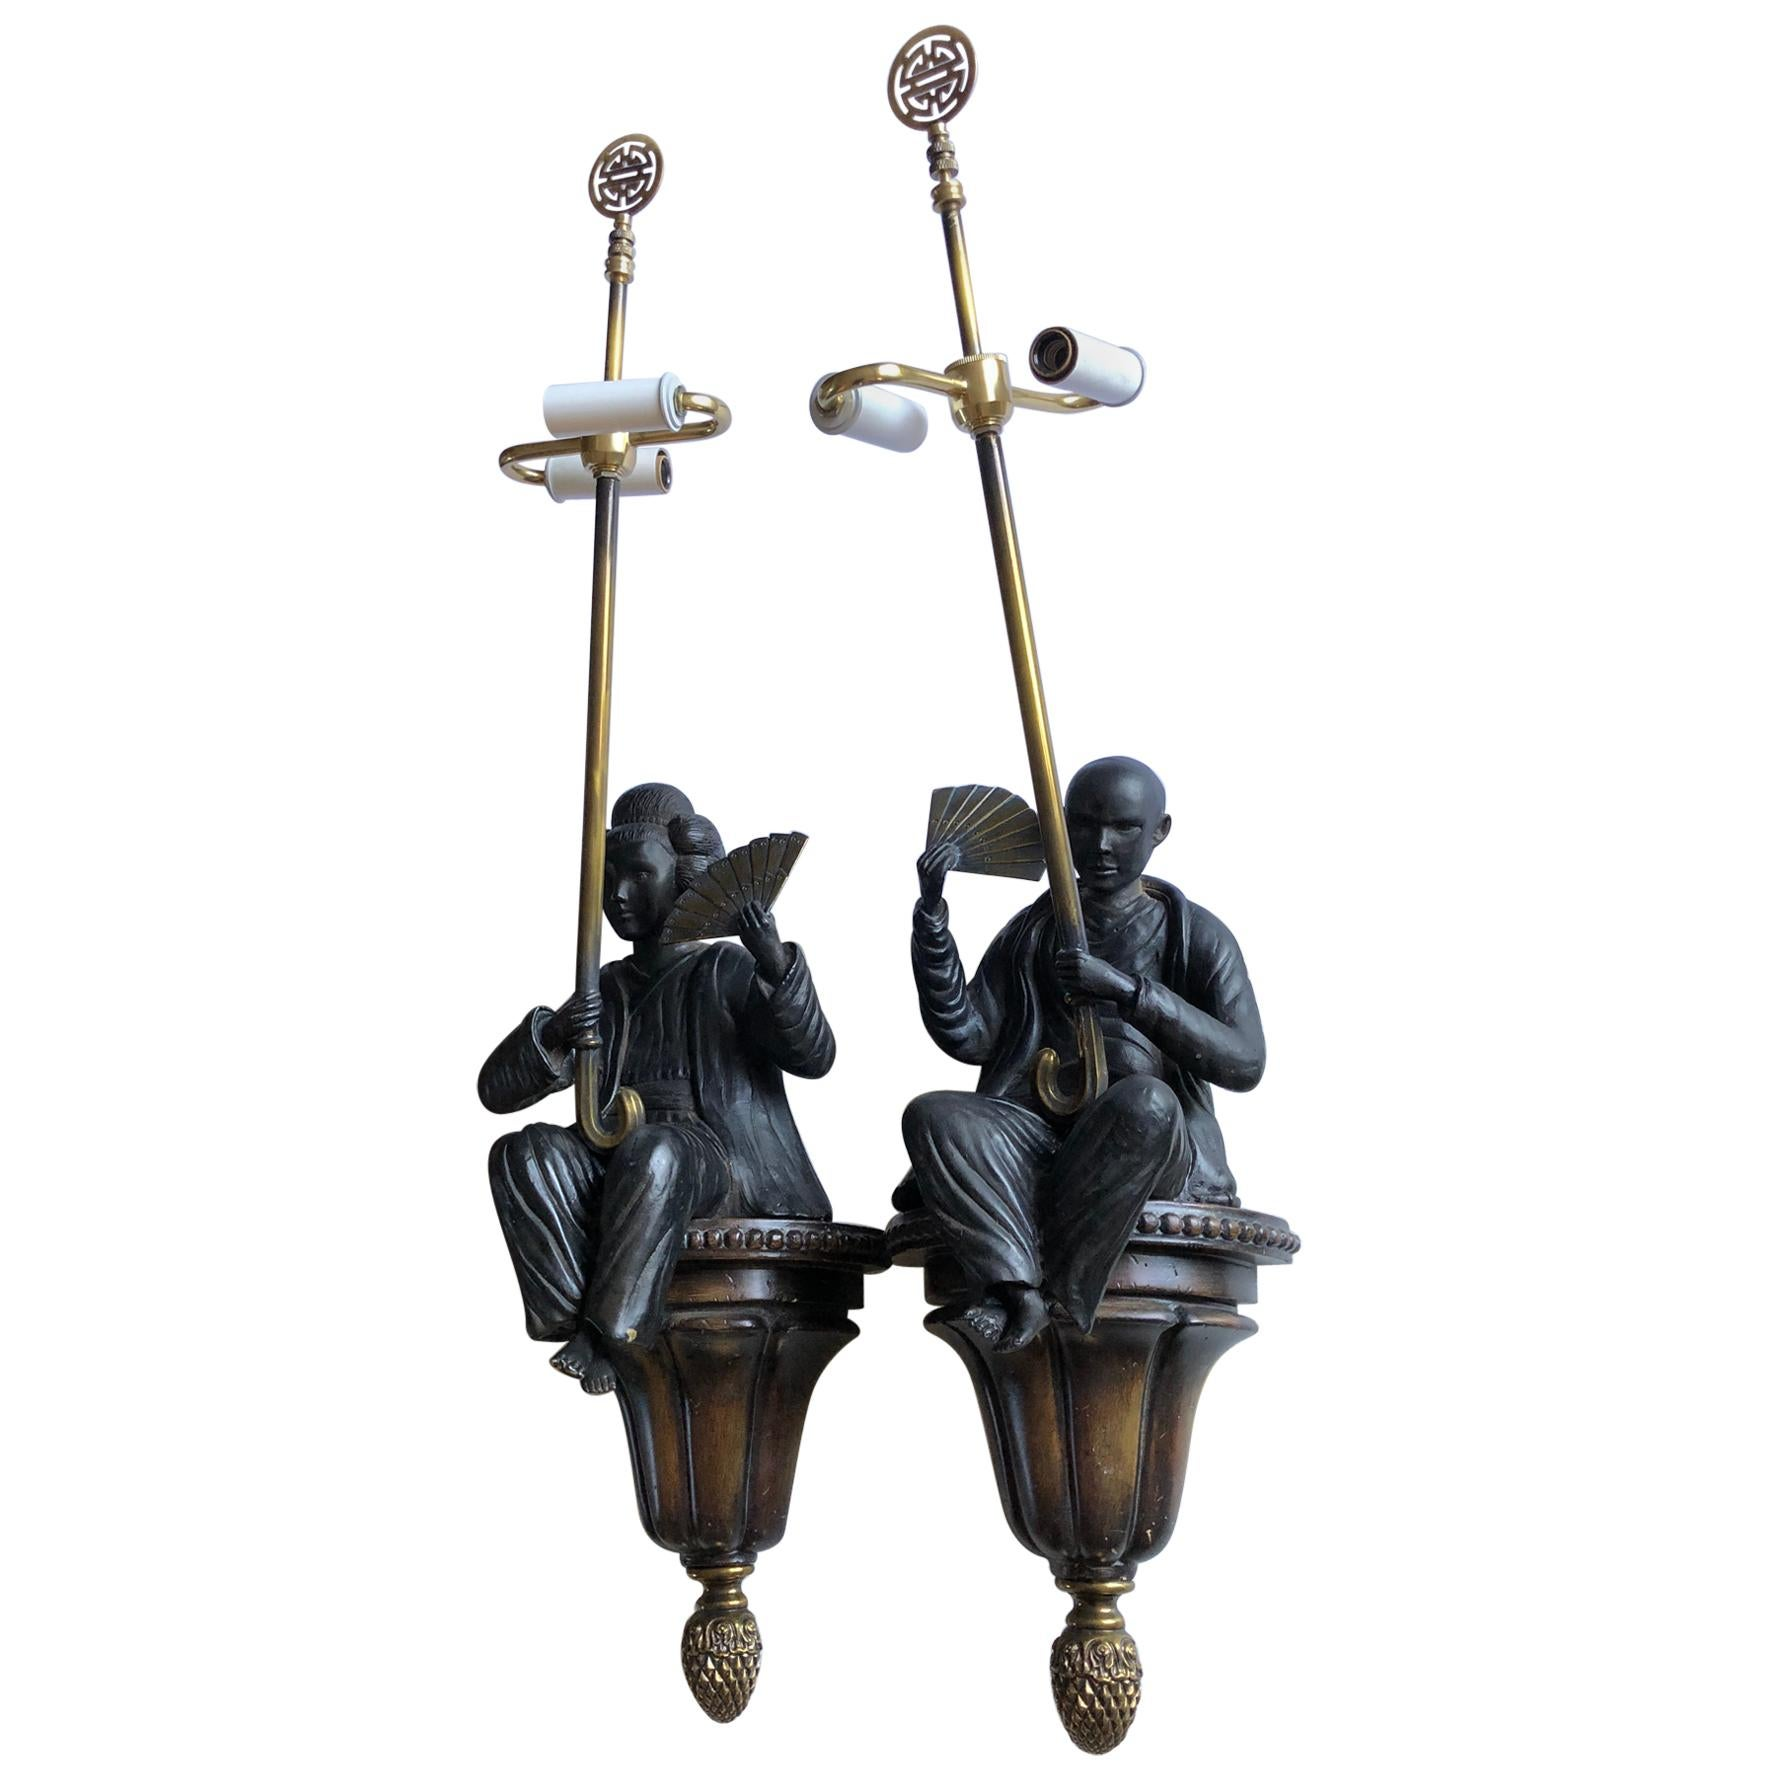 Sensational Pair of Bronze Asian Figural Wall Sconces